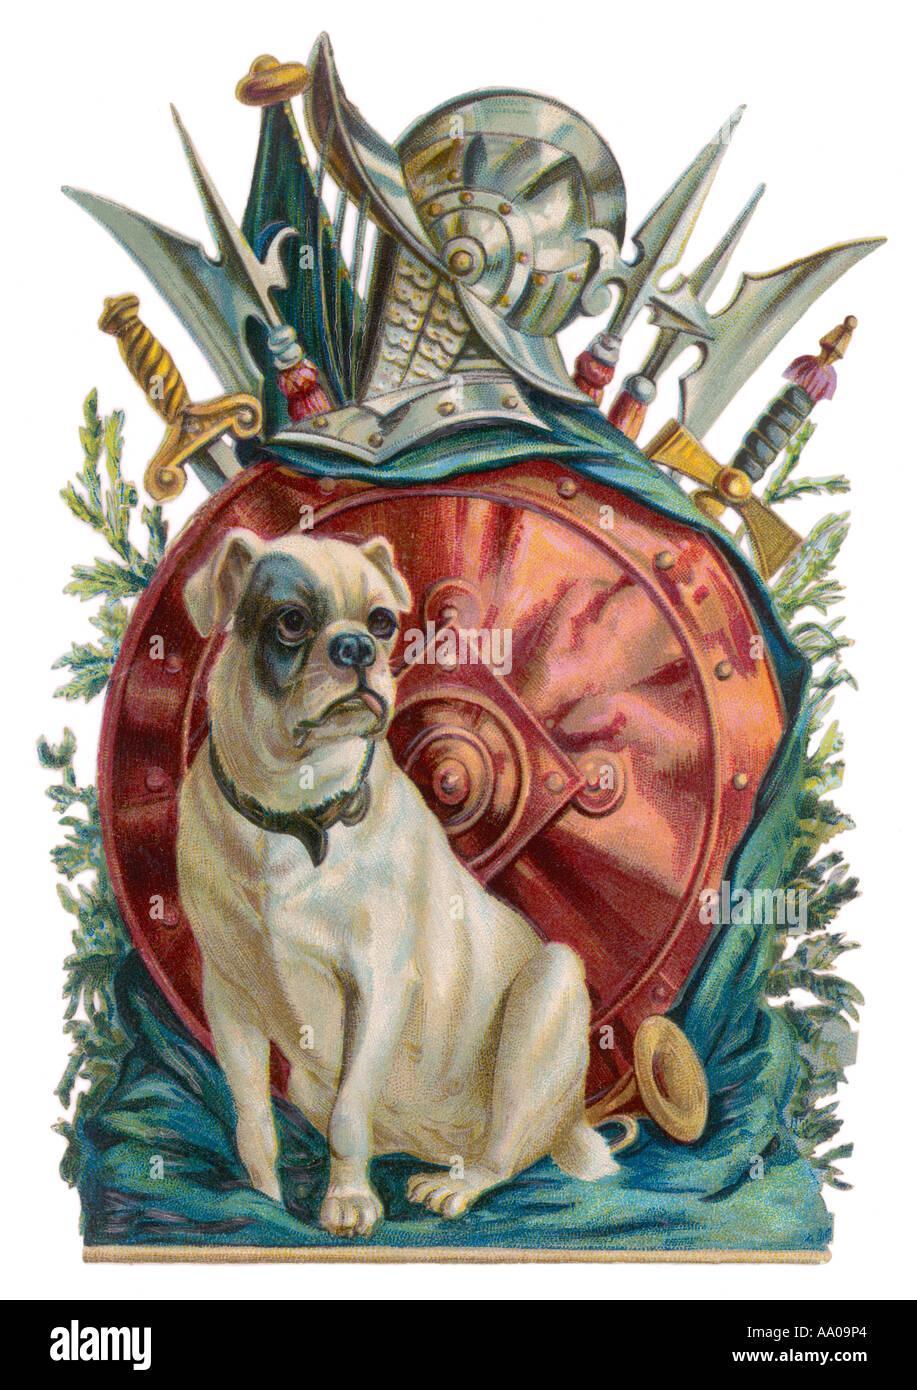 Belligerent Bulldog - Stock Image